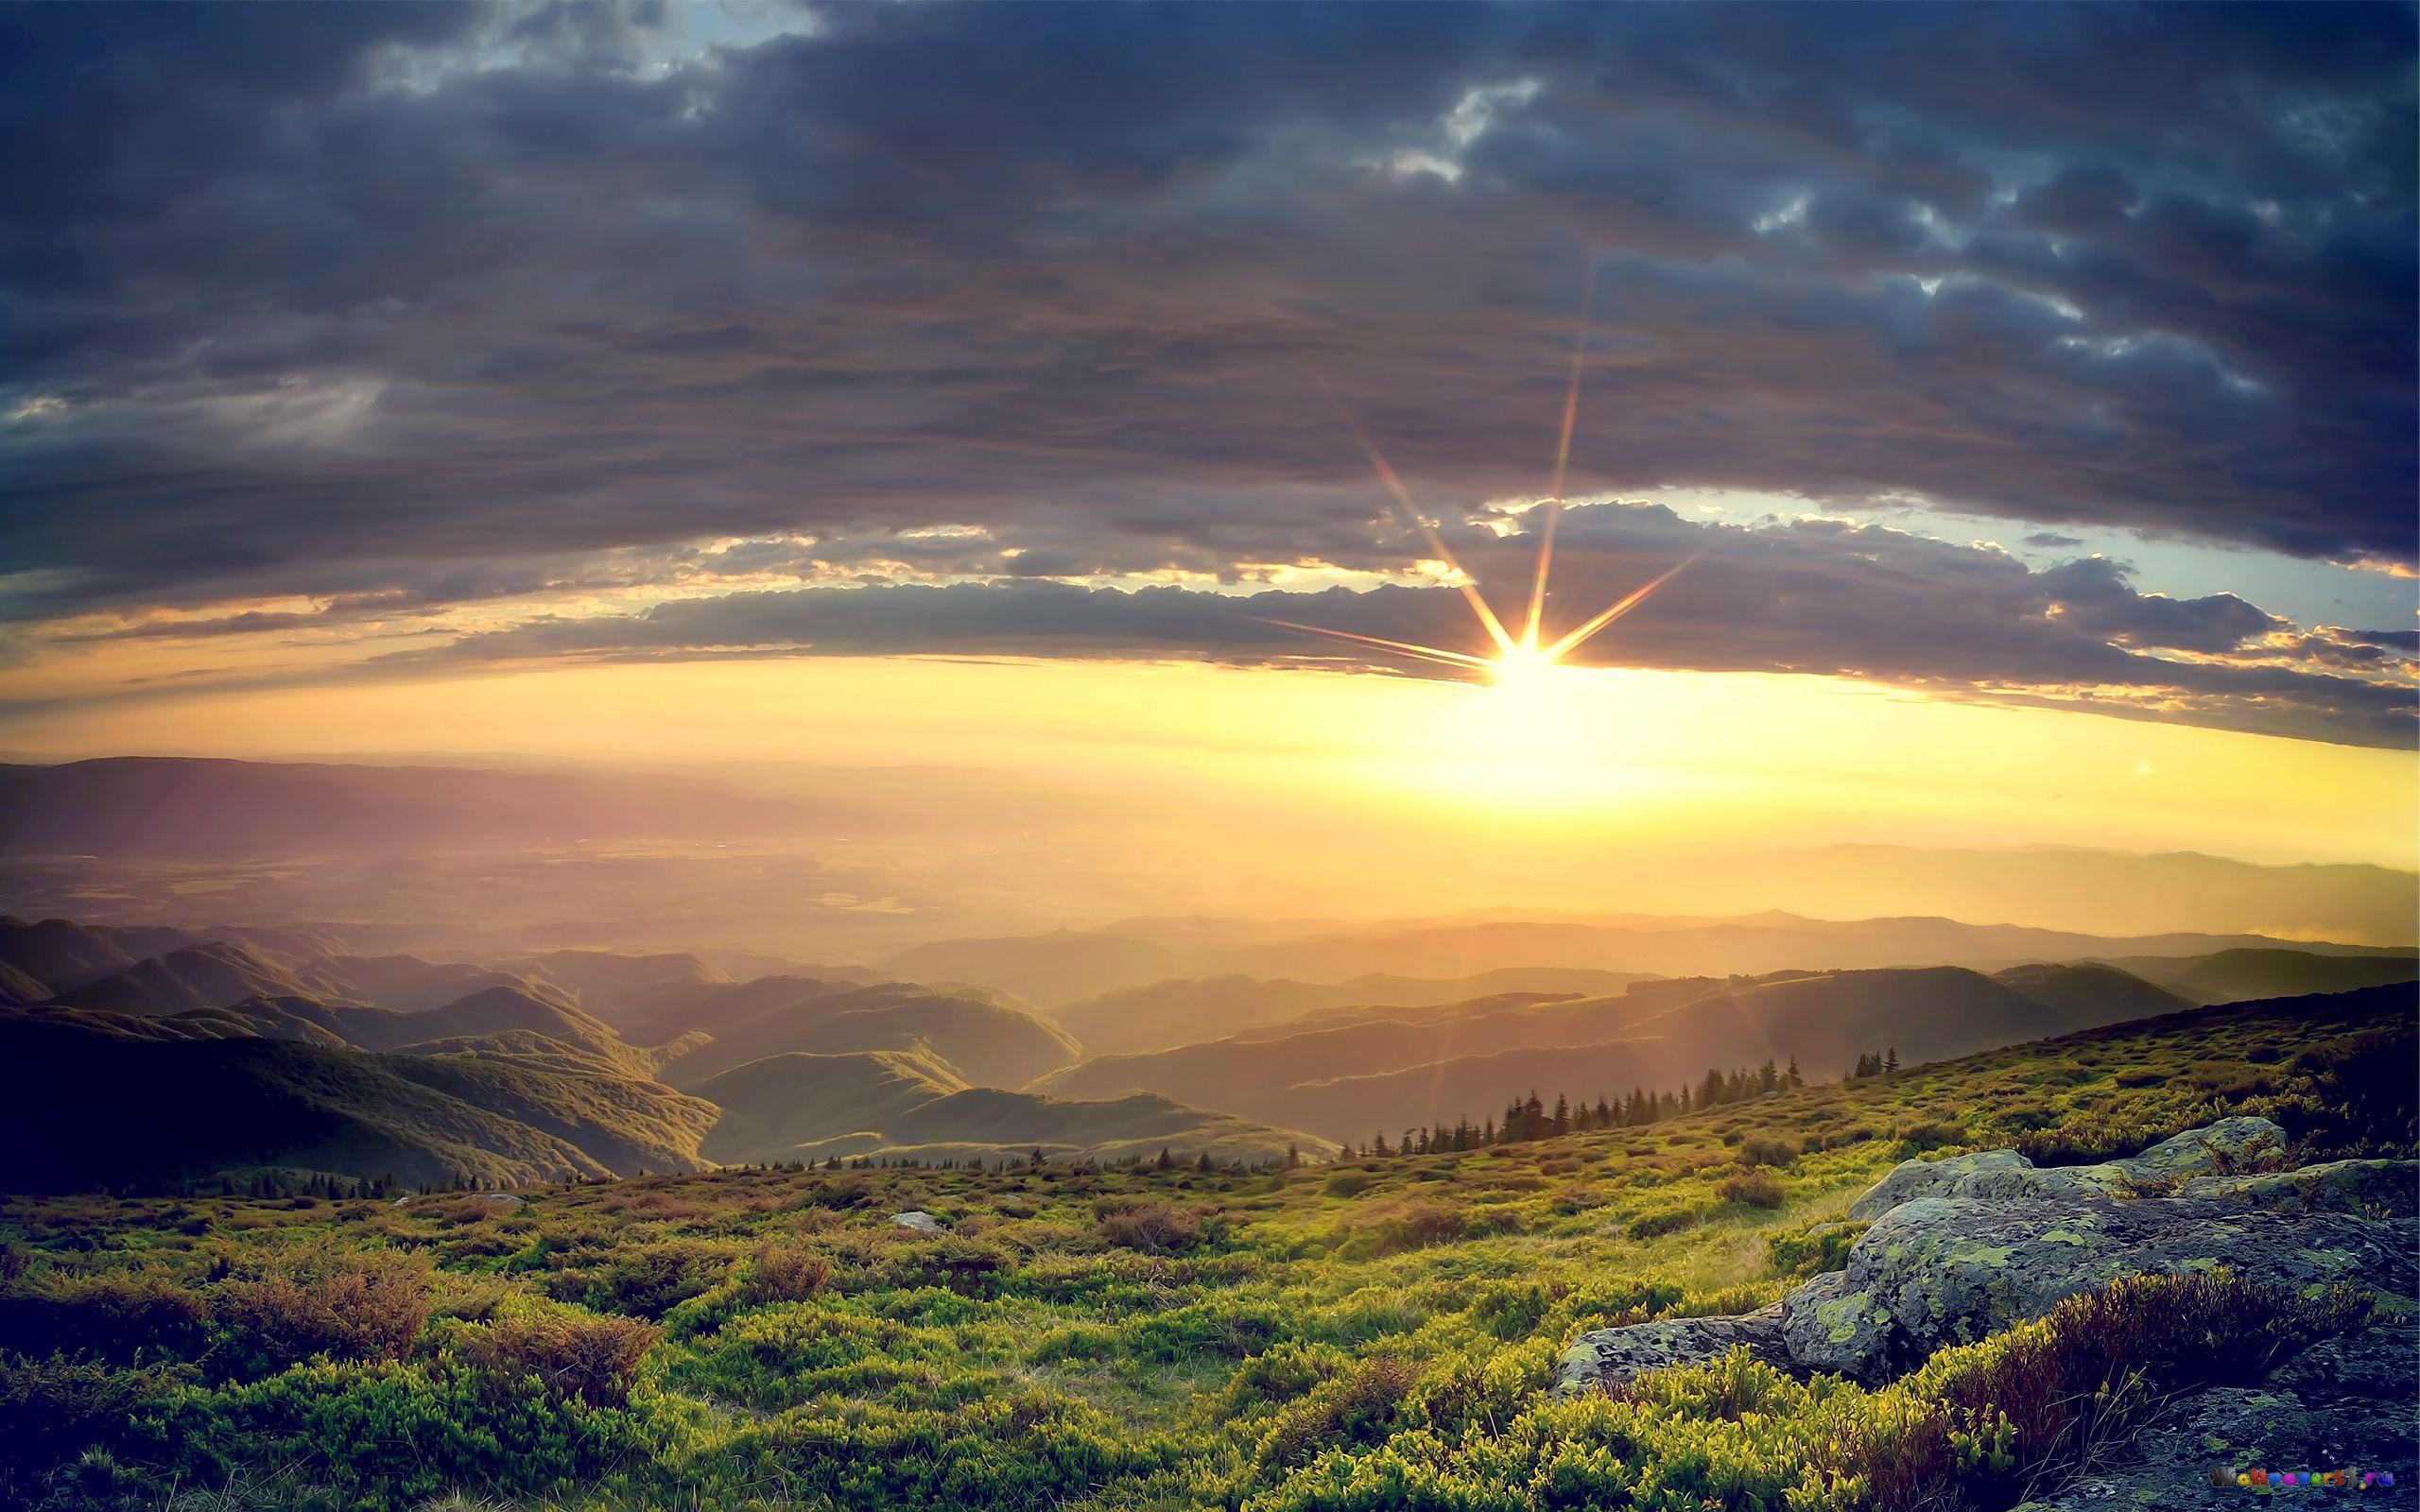 priroda-solnce-visoko-nad-lugami